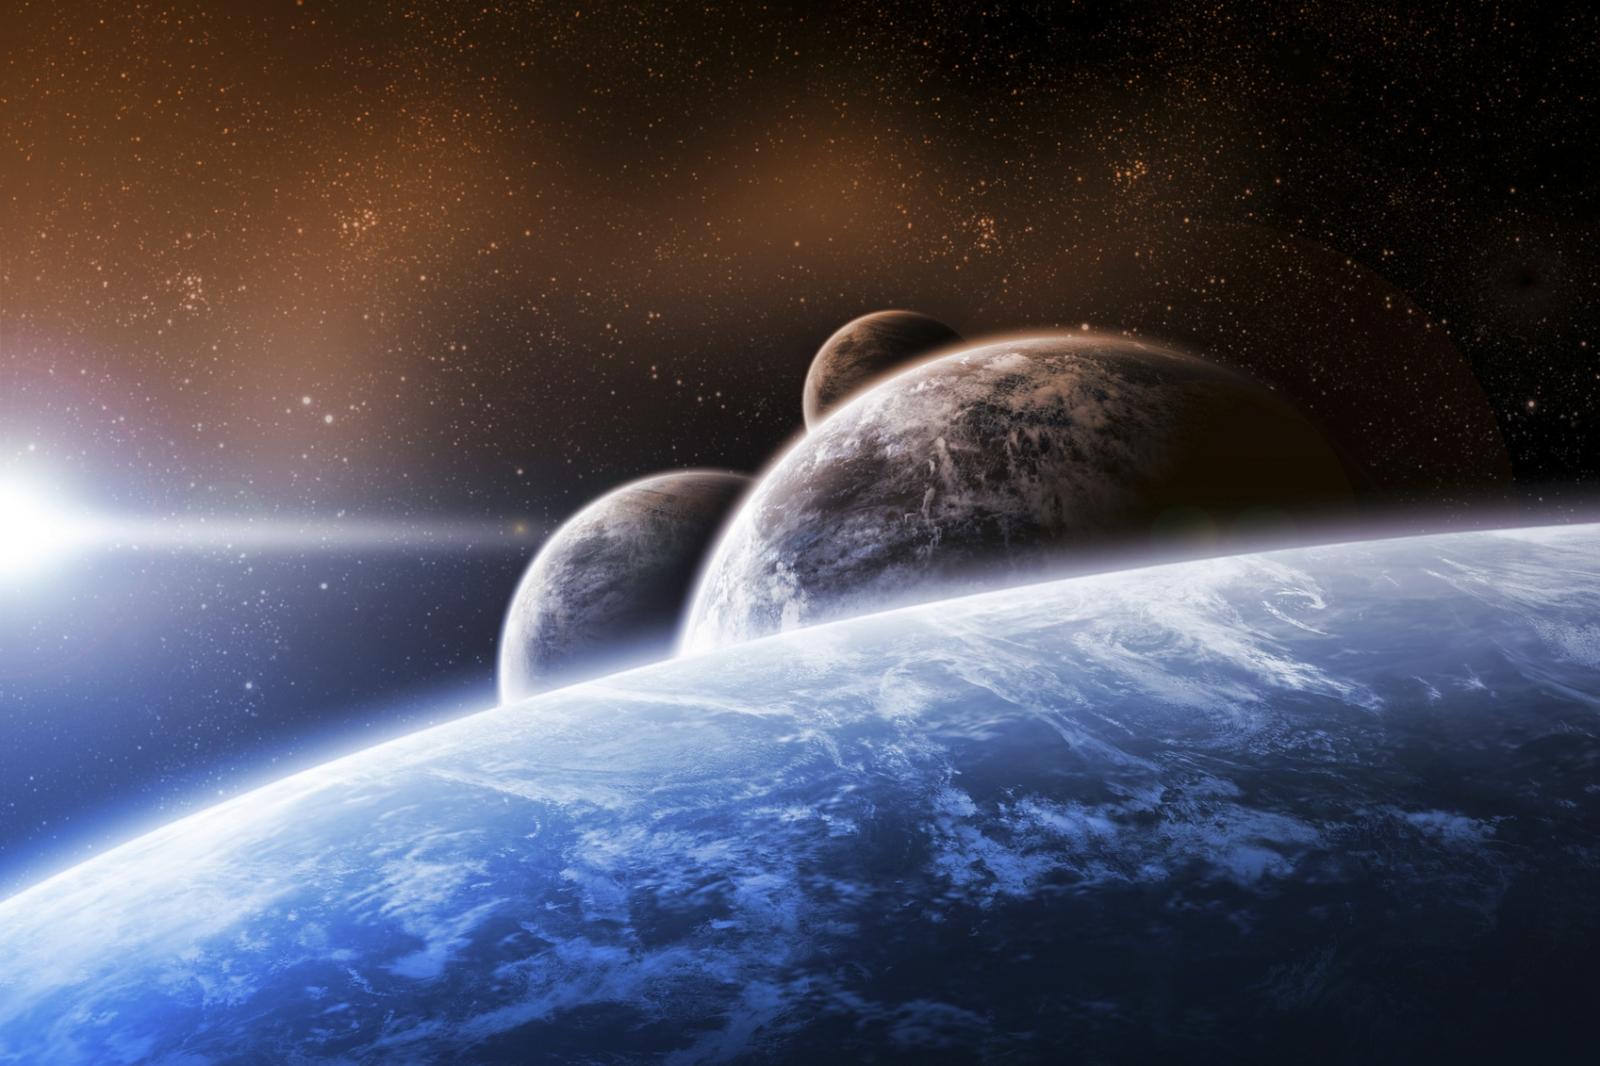 exoplanet life alien world